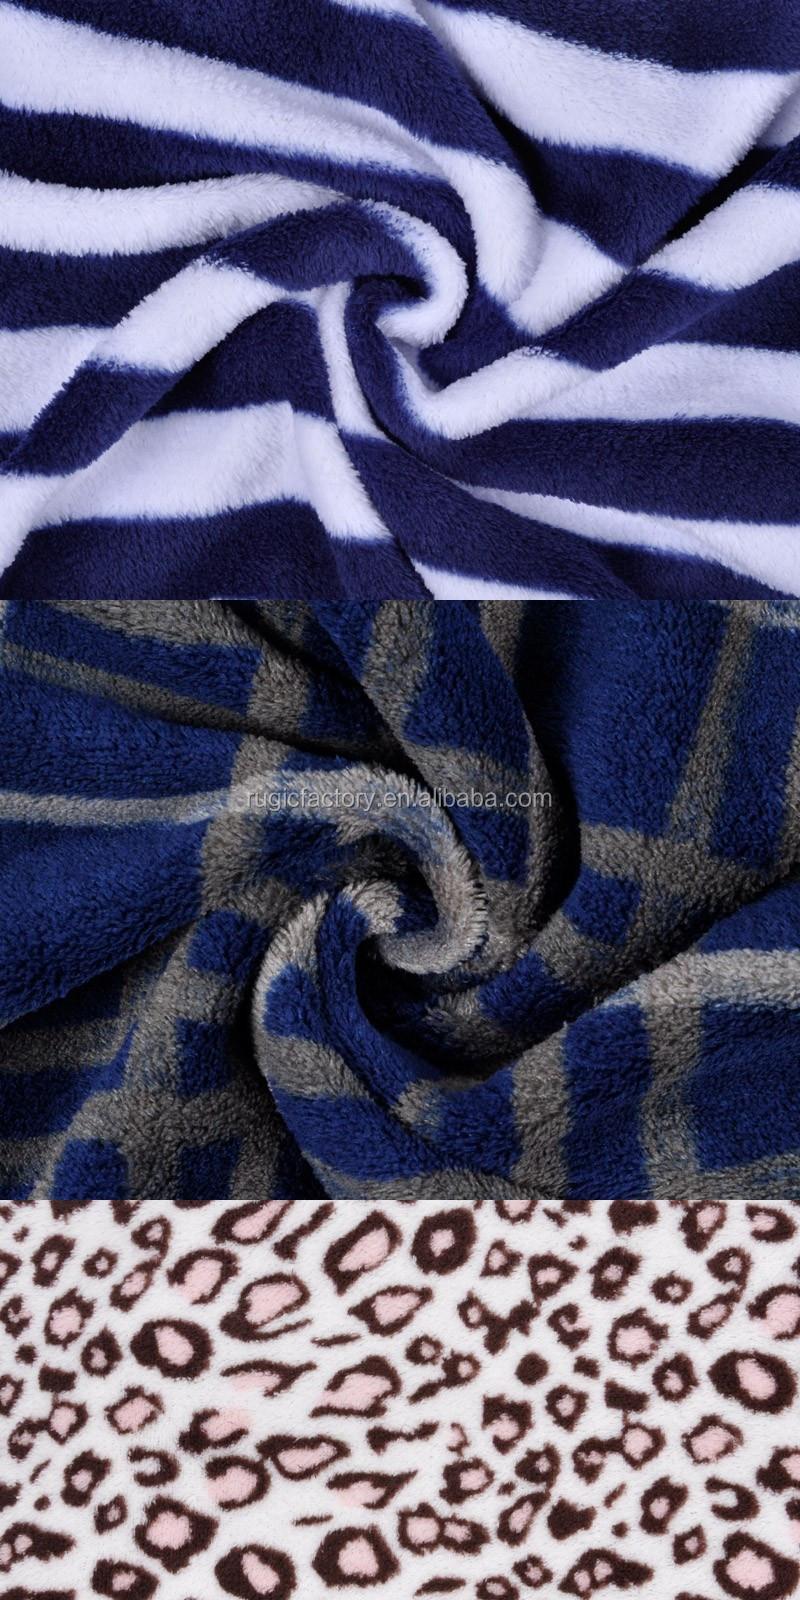 Custom Wholesale Hooded Adult Woman bath robe leopard print Hotel bathrobe 7a389c570